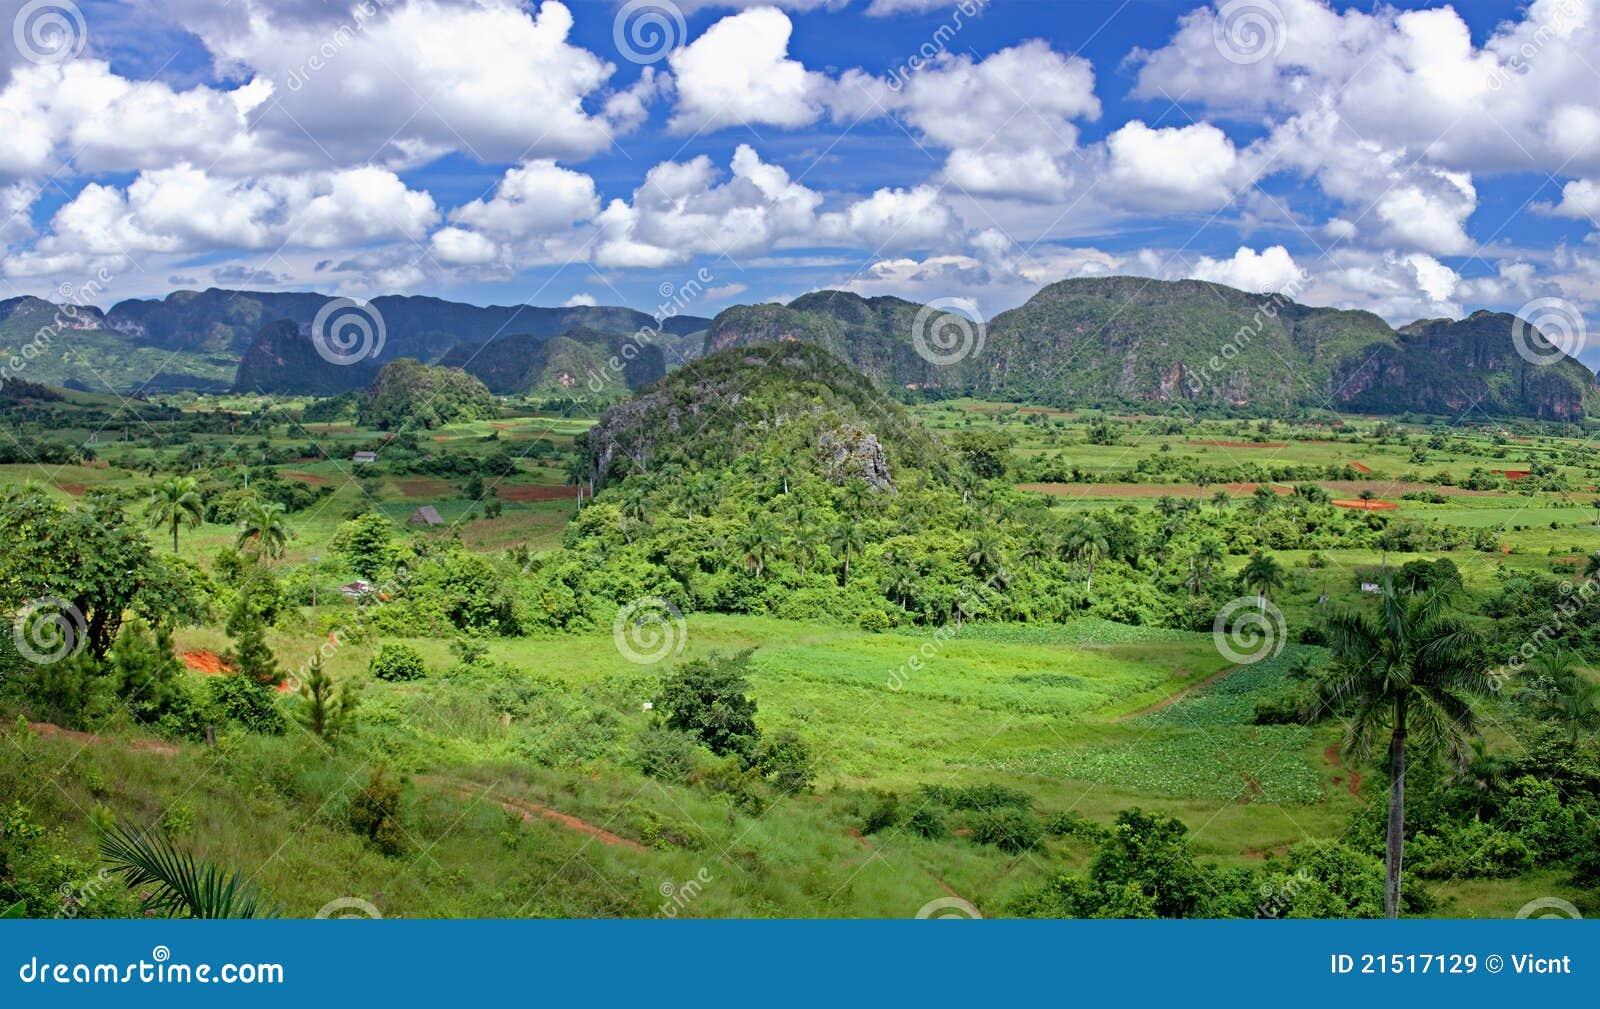 Valley in Cuba